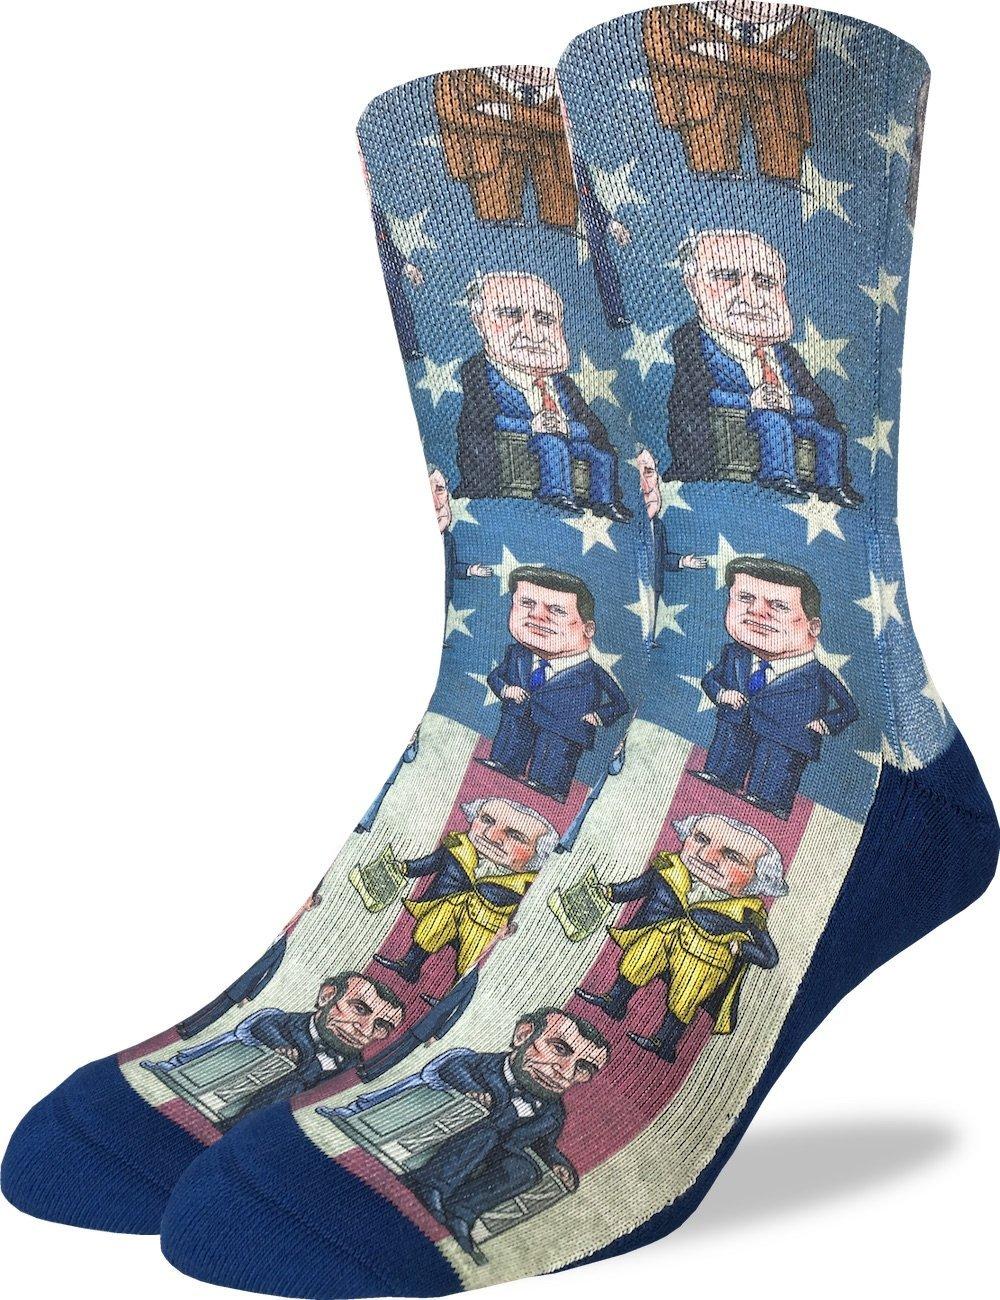 Good Luck Sock Men's Past Presidents of United States Crew Socks - Blue, Adult Shoe Size 8-13